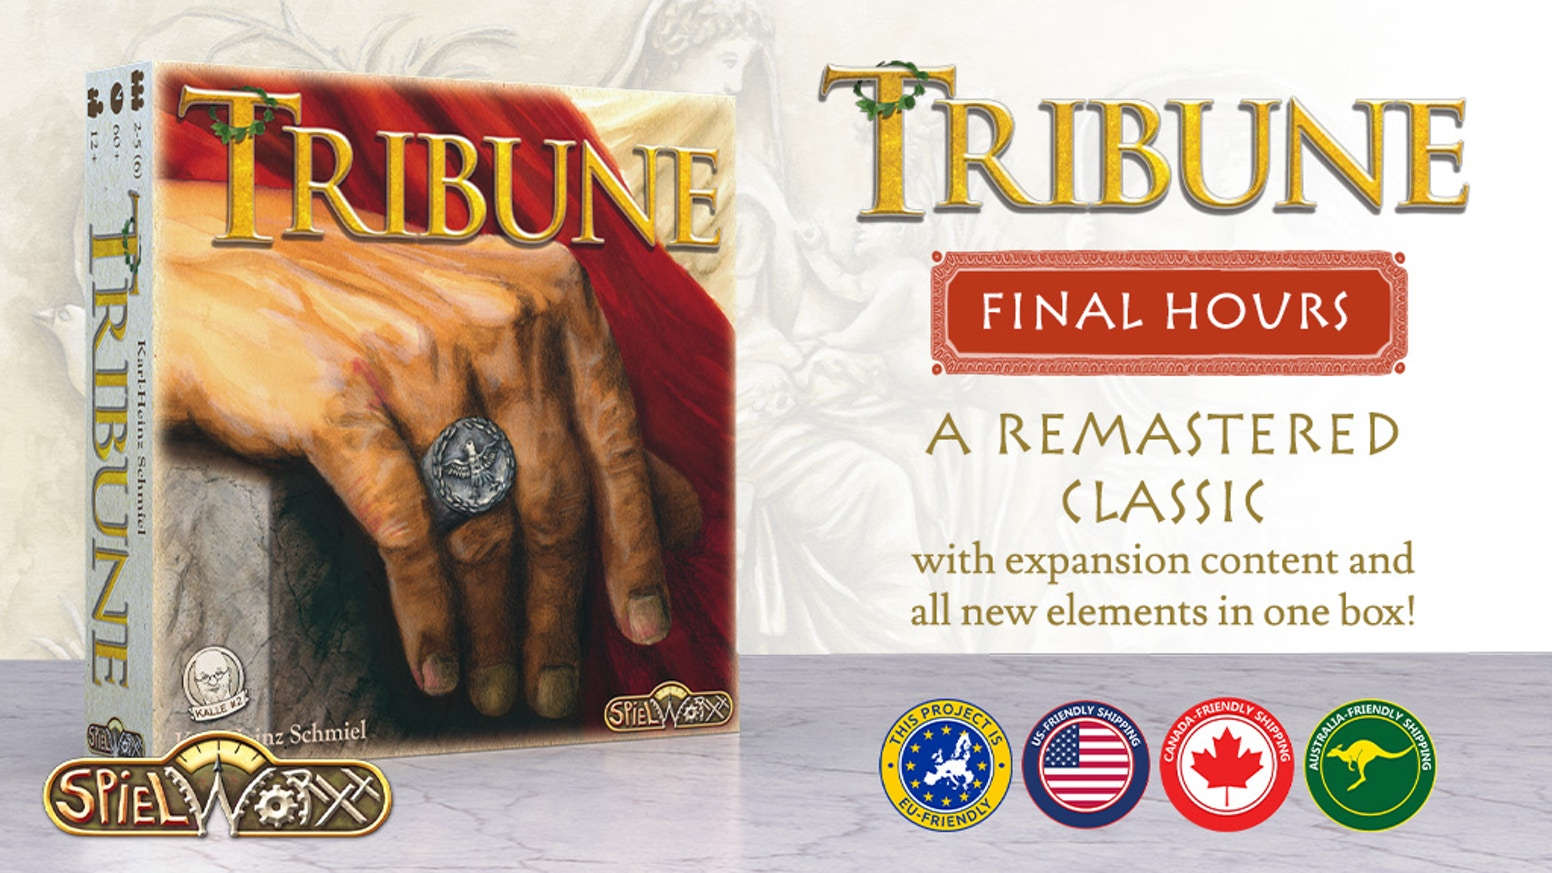 Tribune: Primus Inter Pares & Expansion with new mechanisms & features!